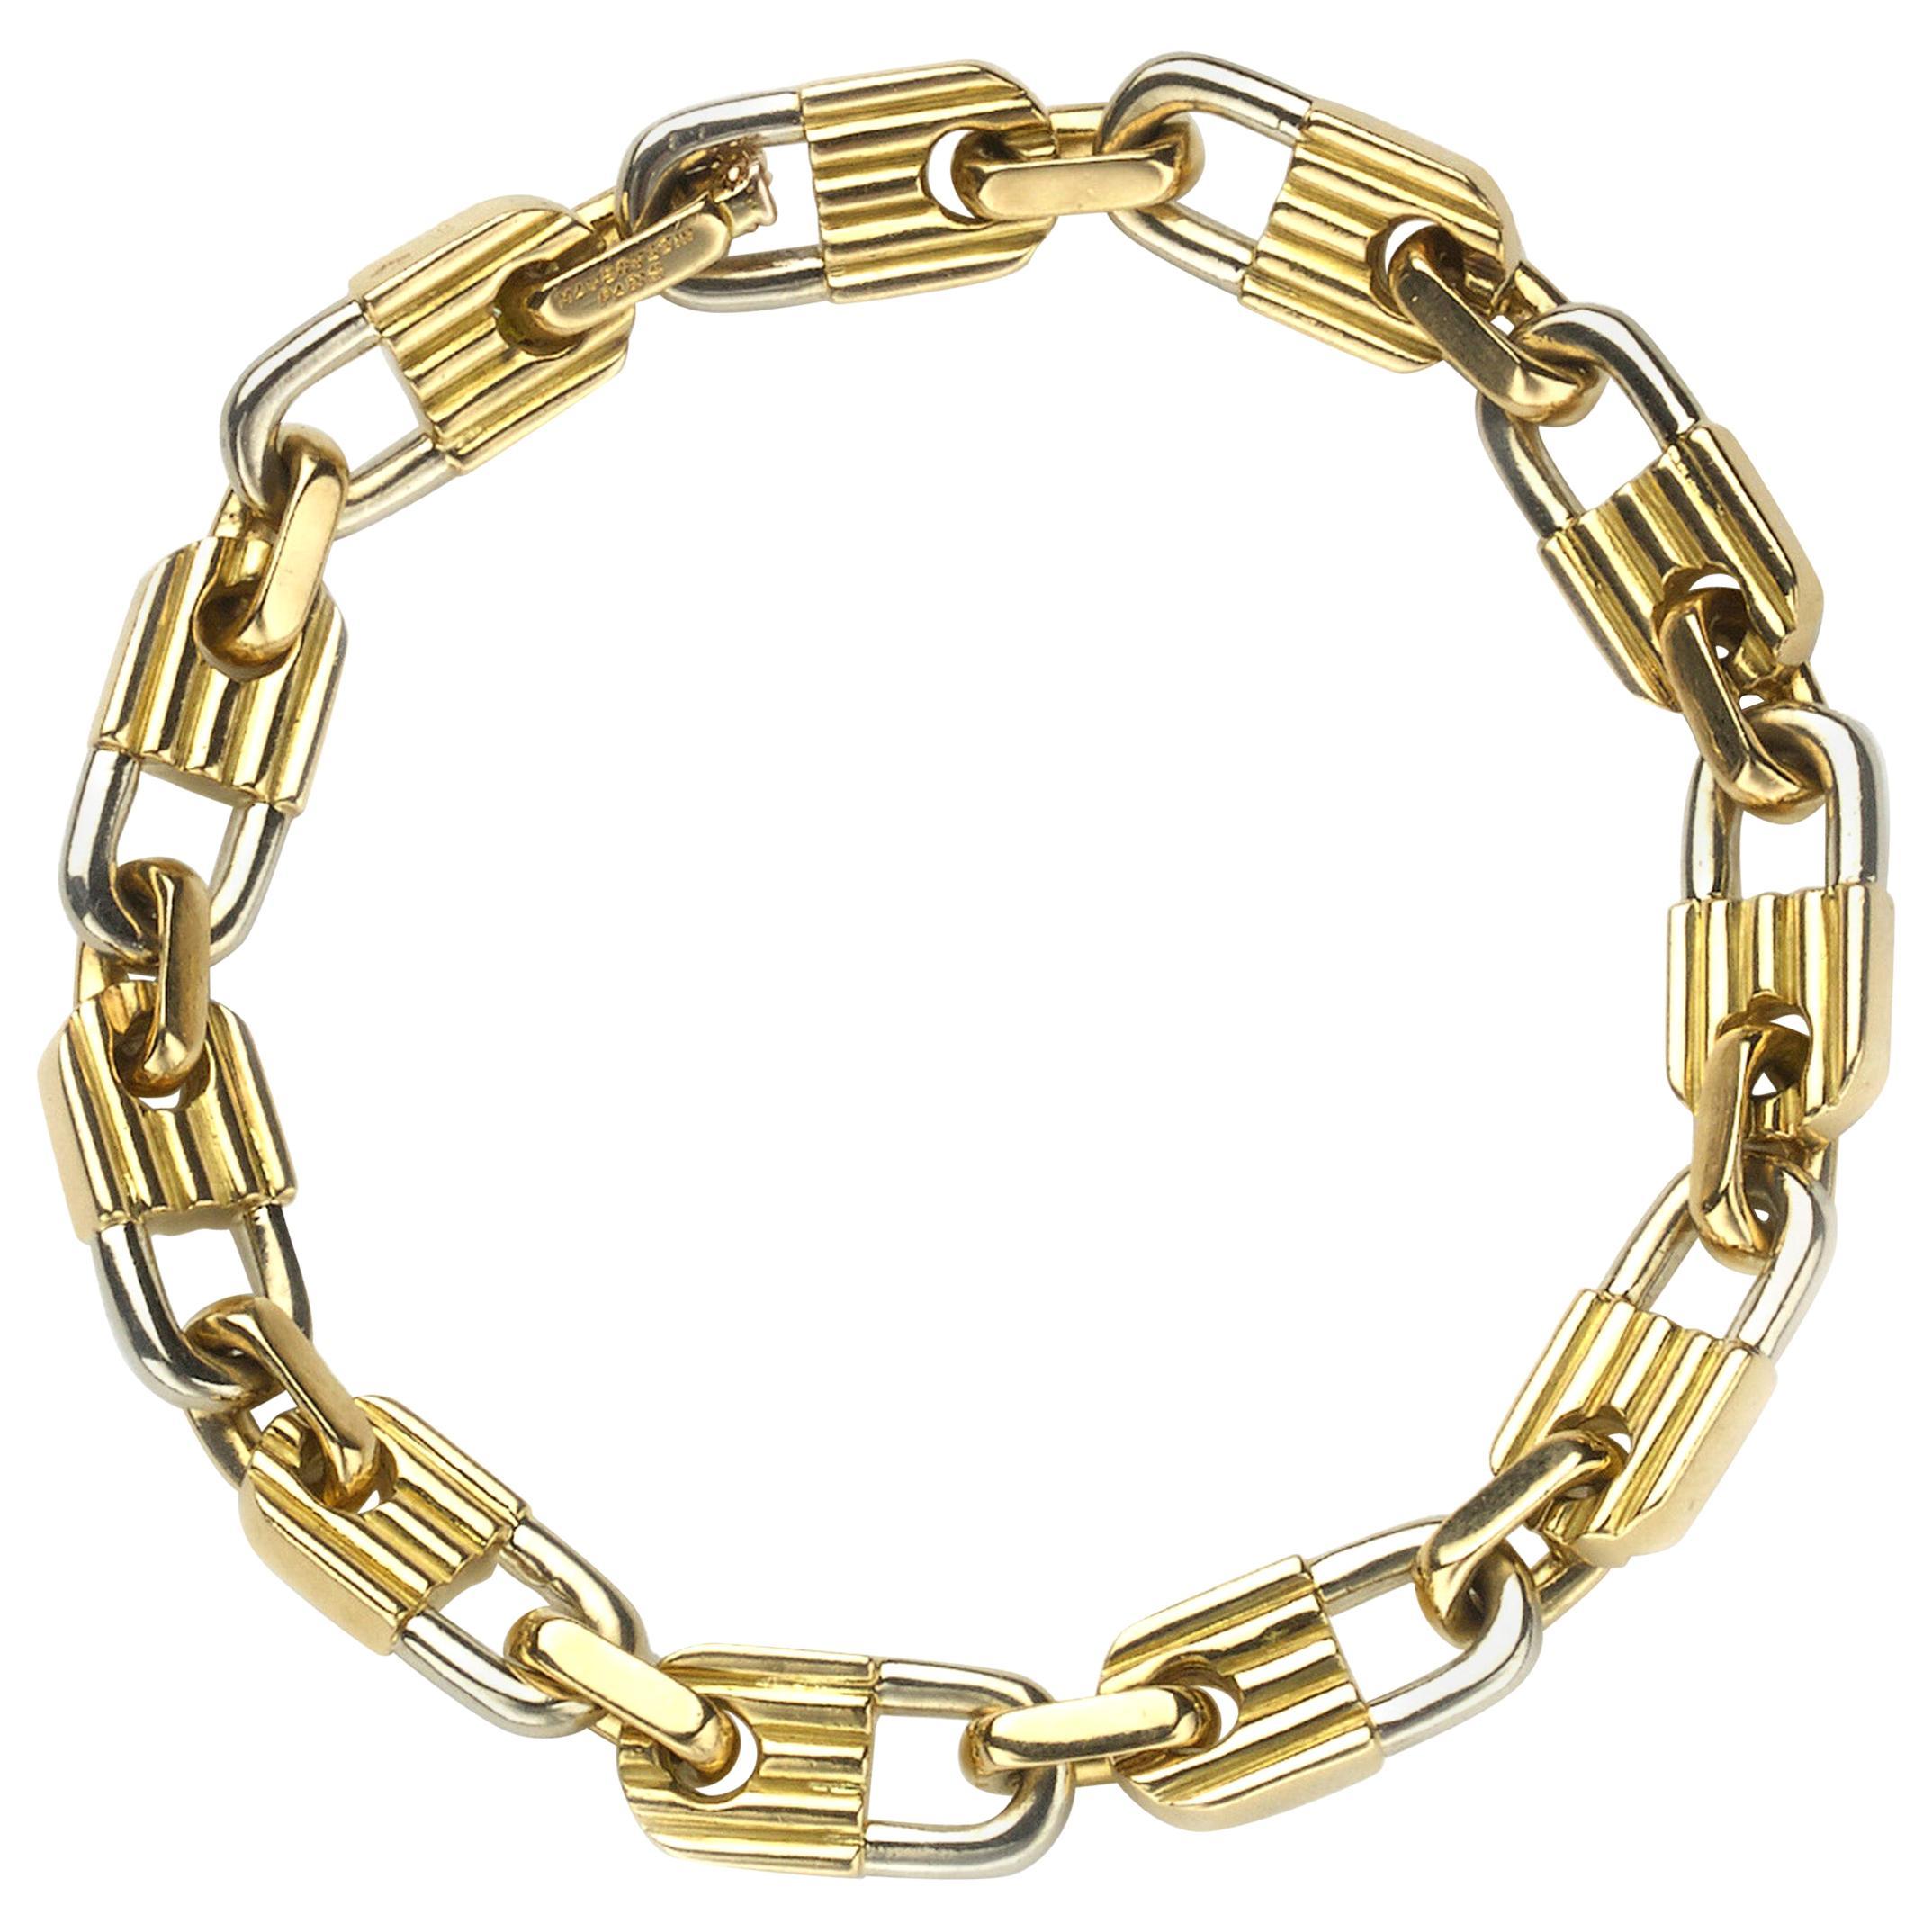 Mauboussin Bi-Color Gold Padlock Bracelet, circa 1980